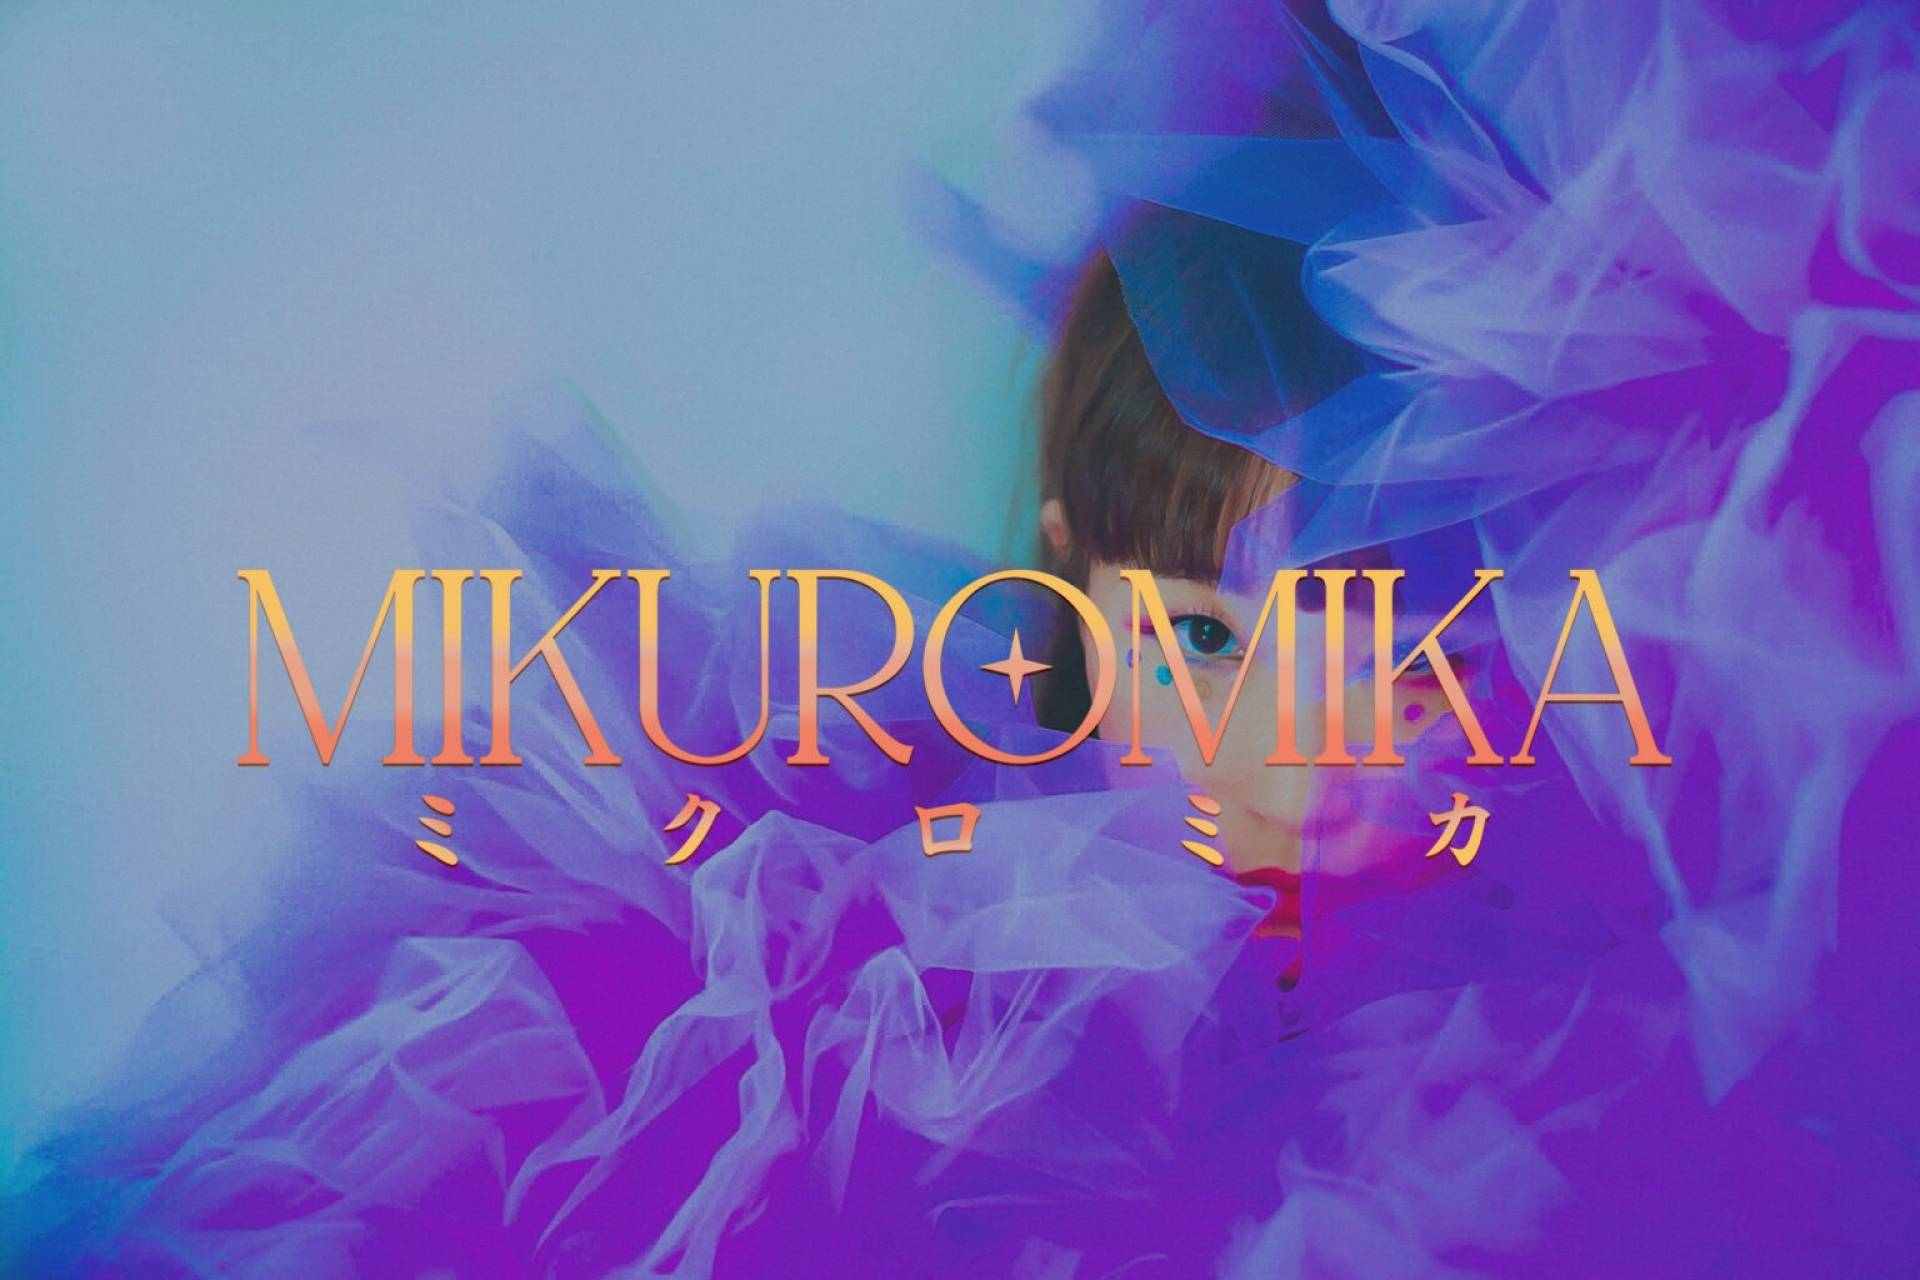 MIKUROMIKA